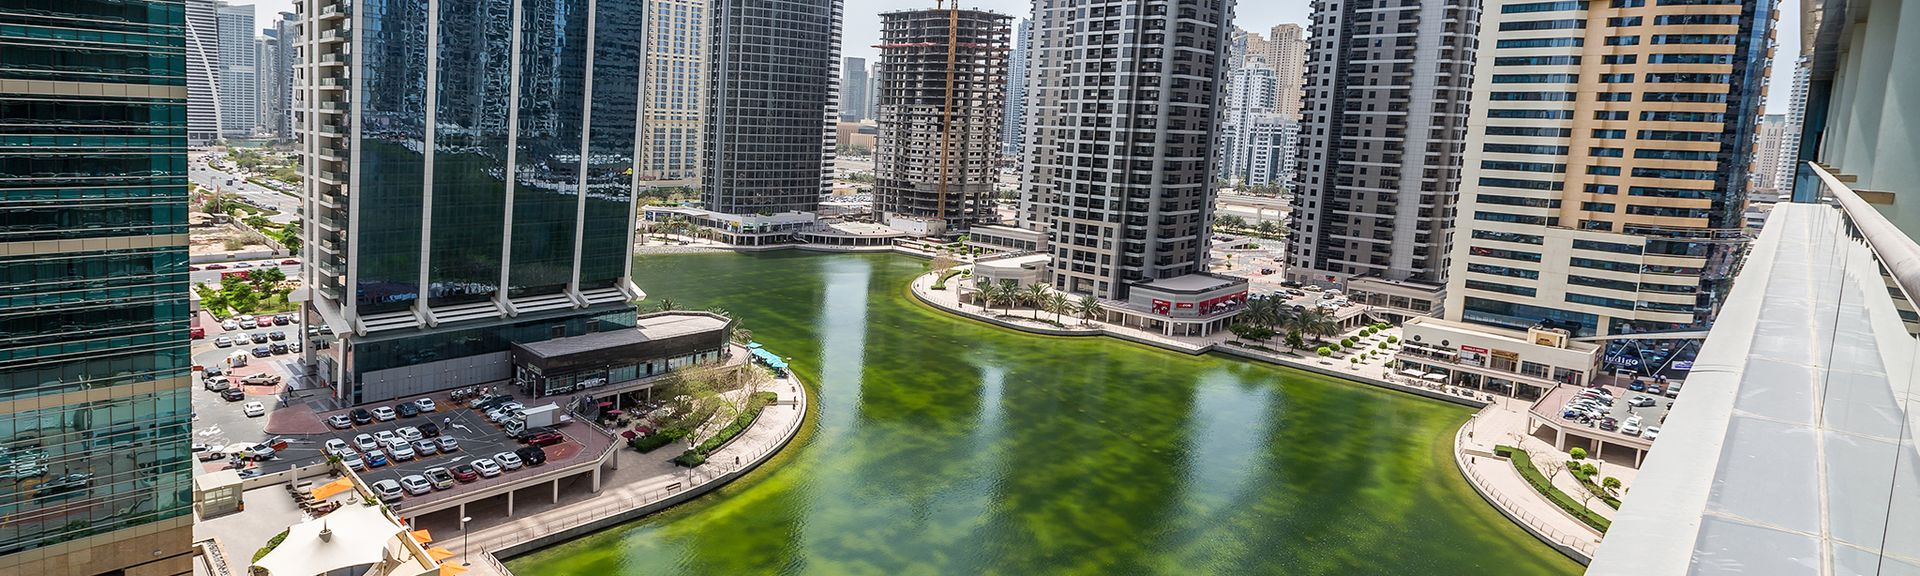 Jumeirah Village, Dubaj, Dubaj, Zjednoczone Emiraty Arabskie